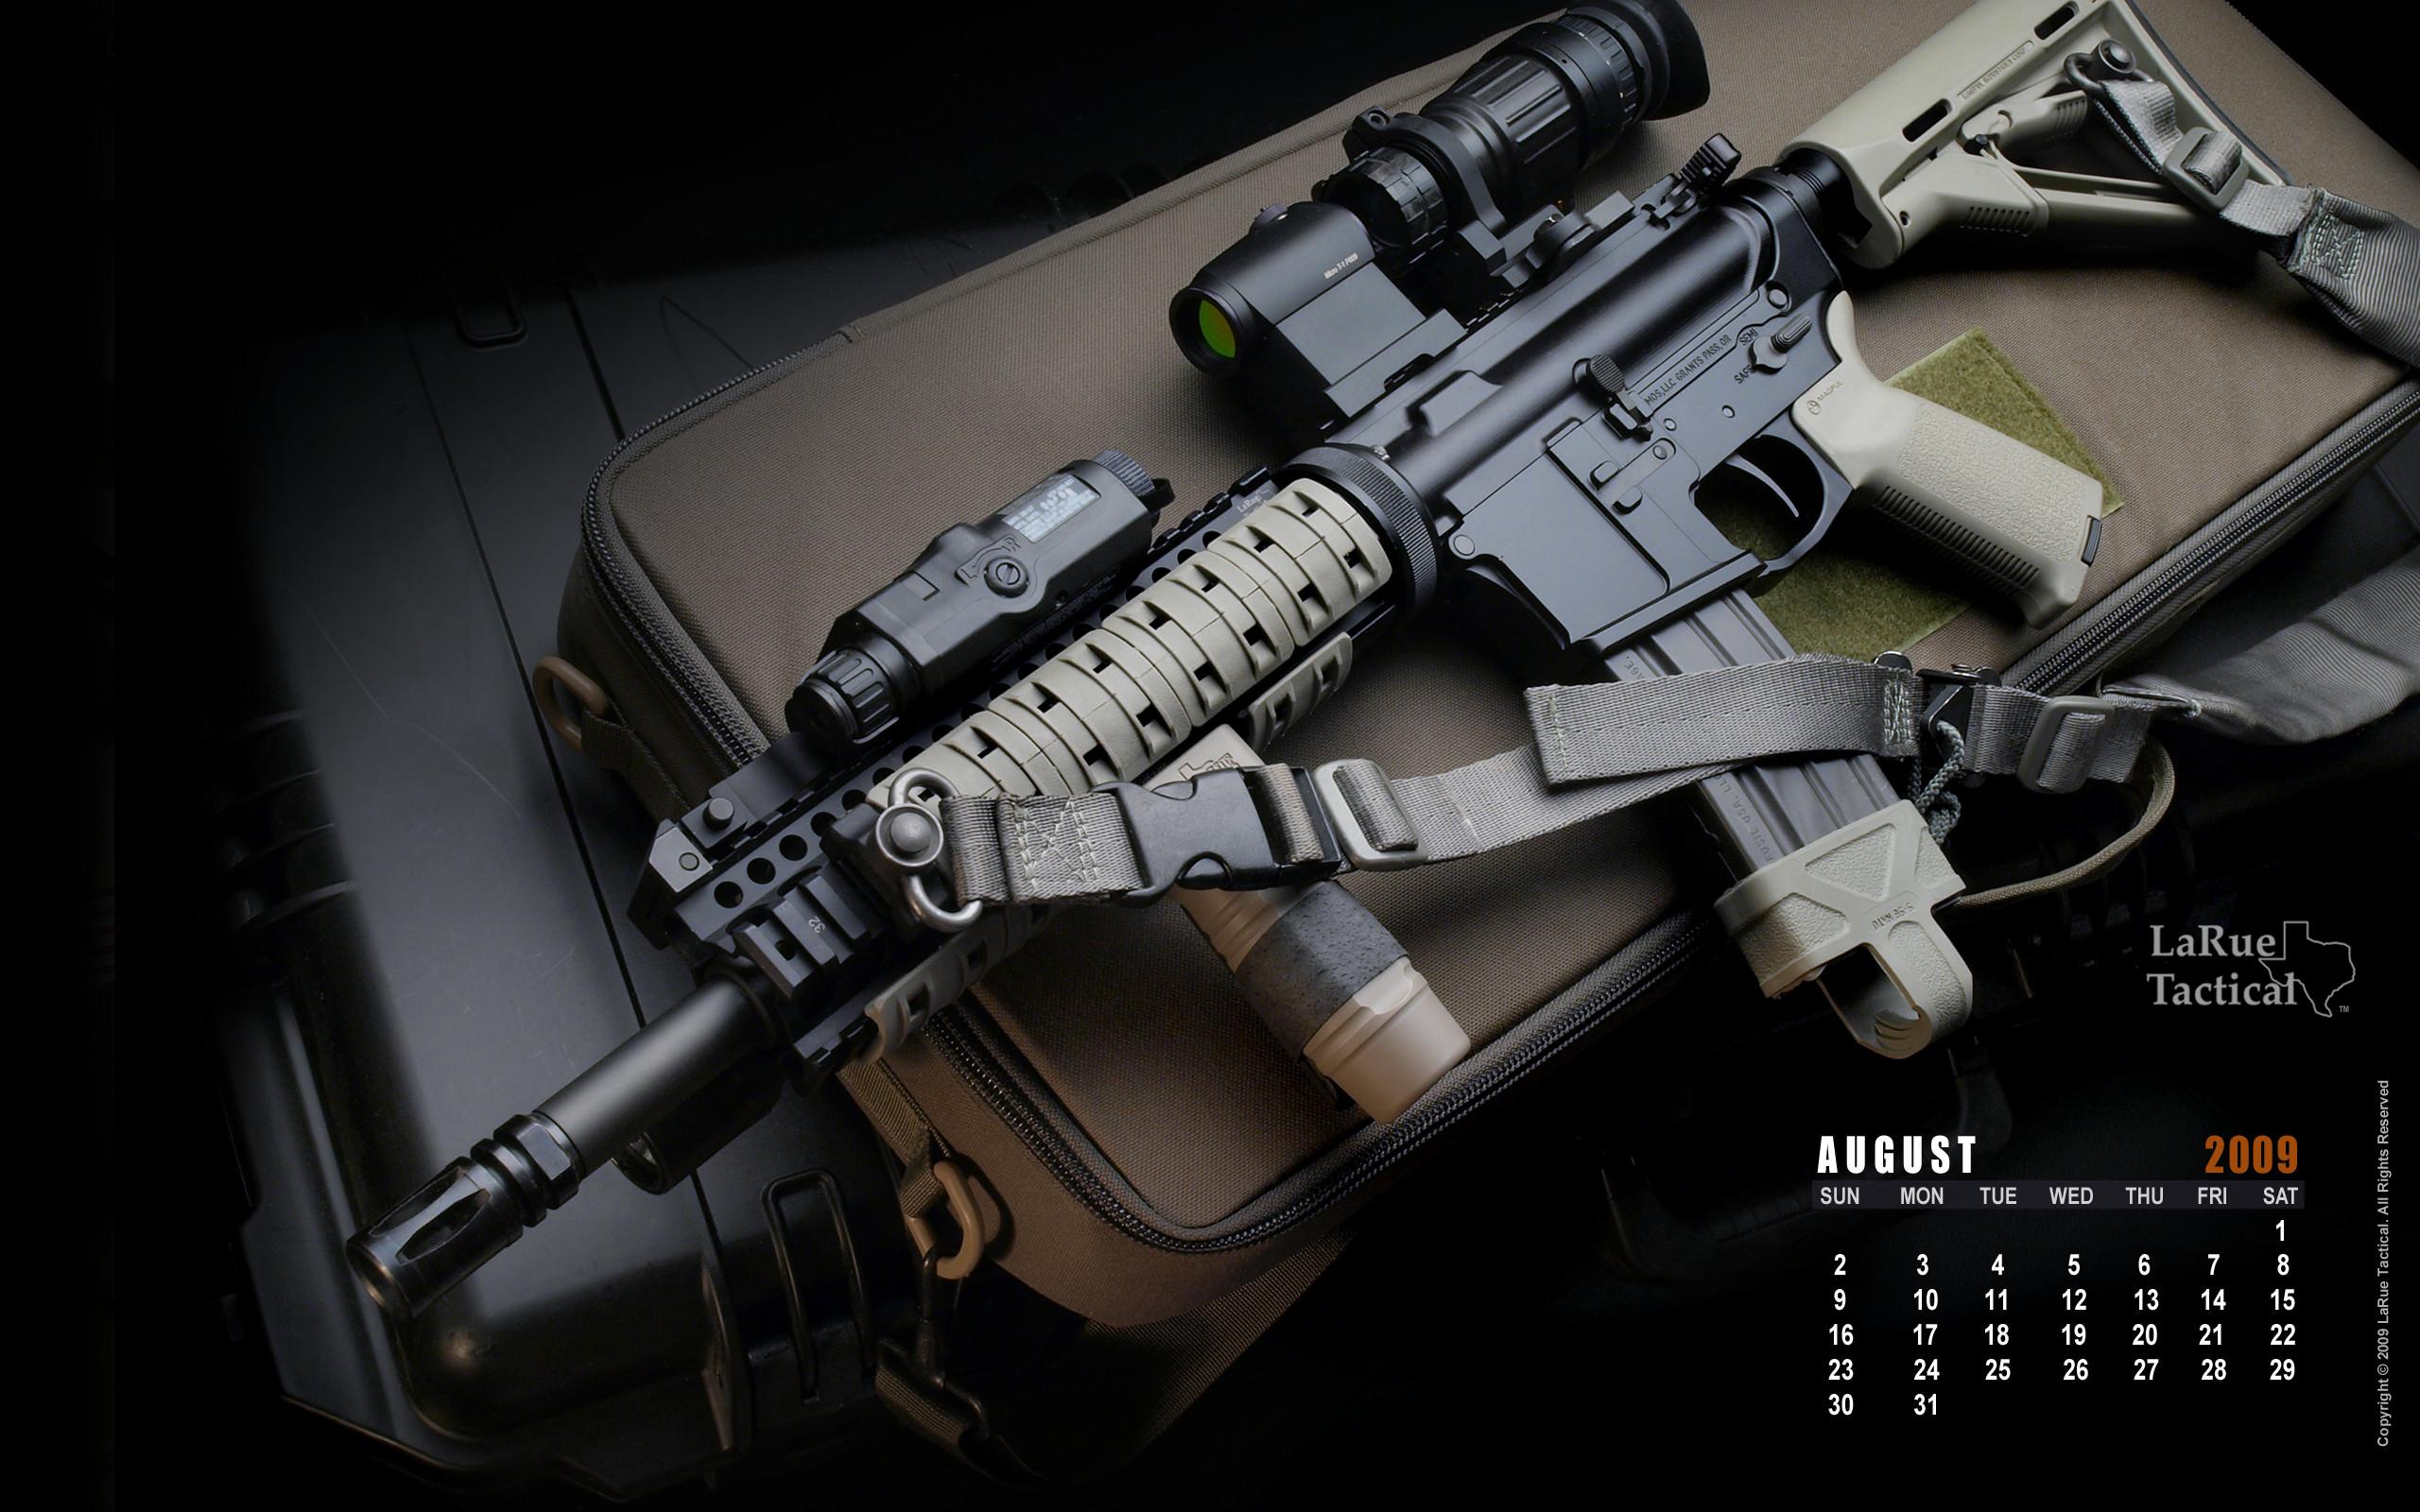 Aimpoint AR 15 Calendar Guns LaRue Tactical Weapons